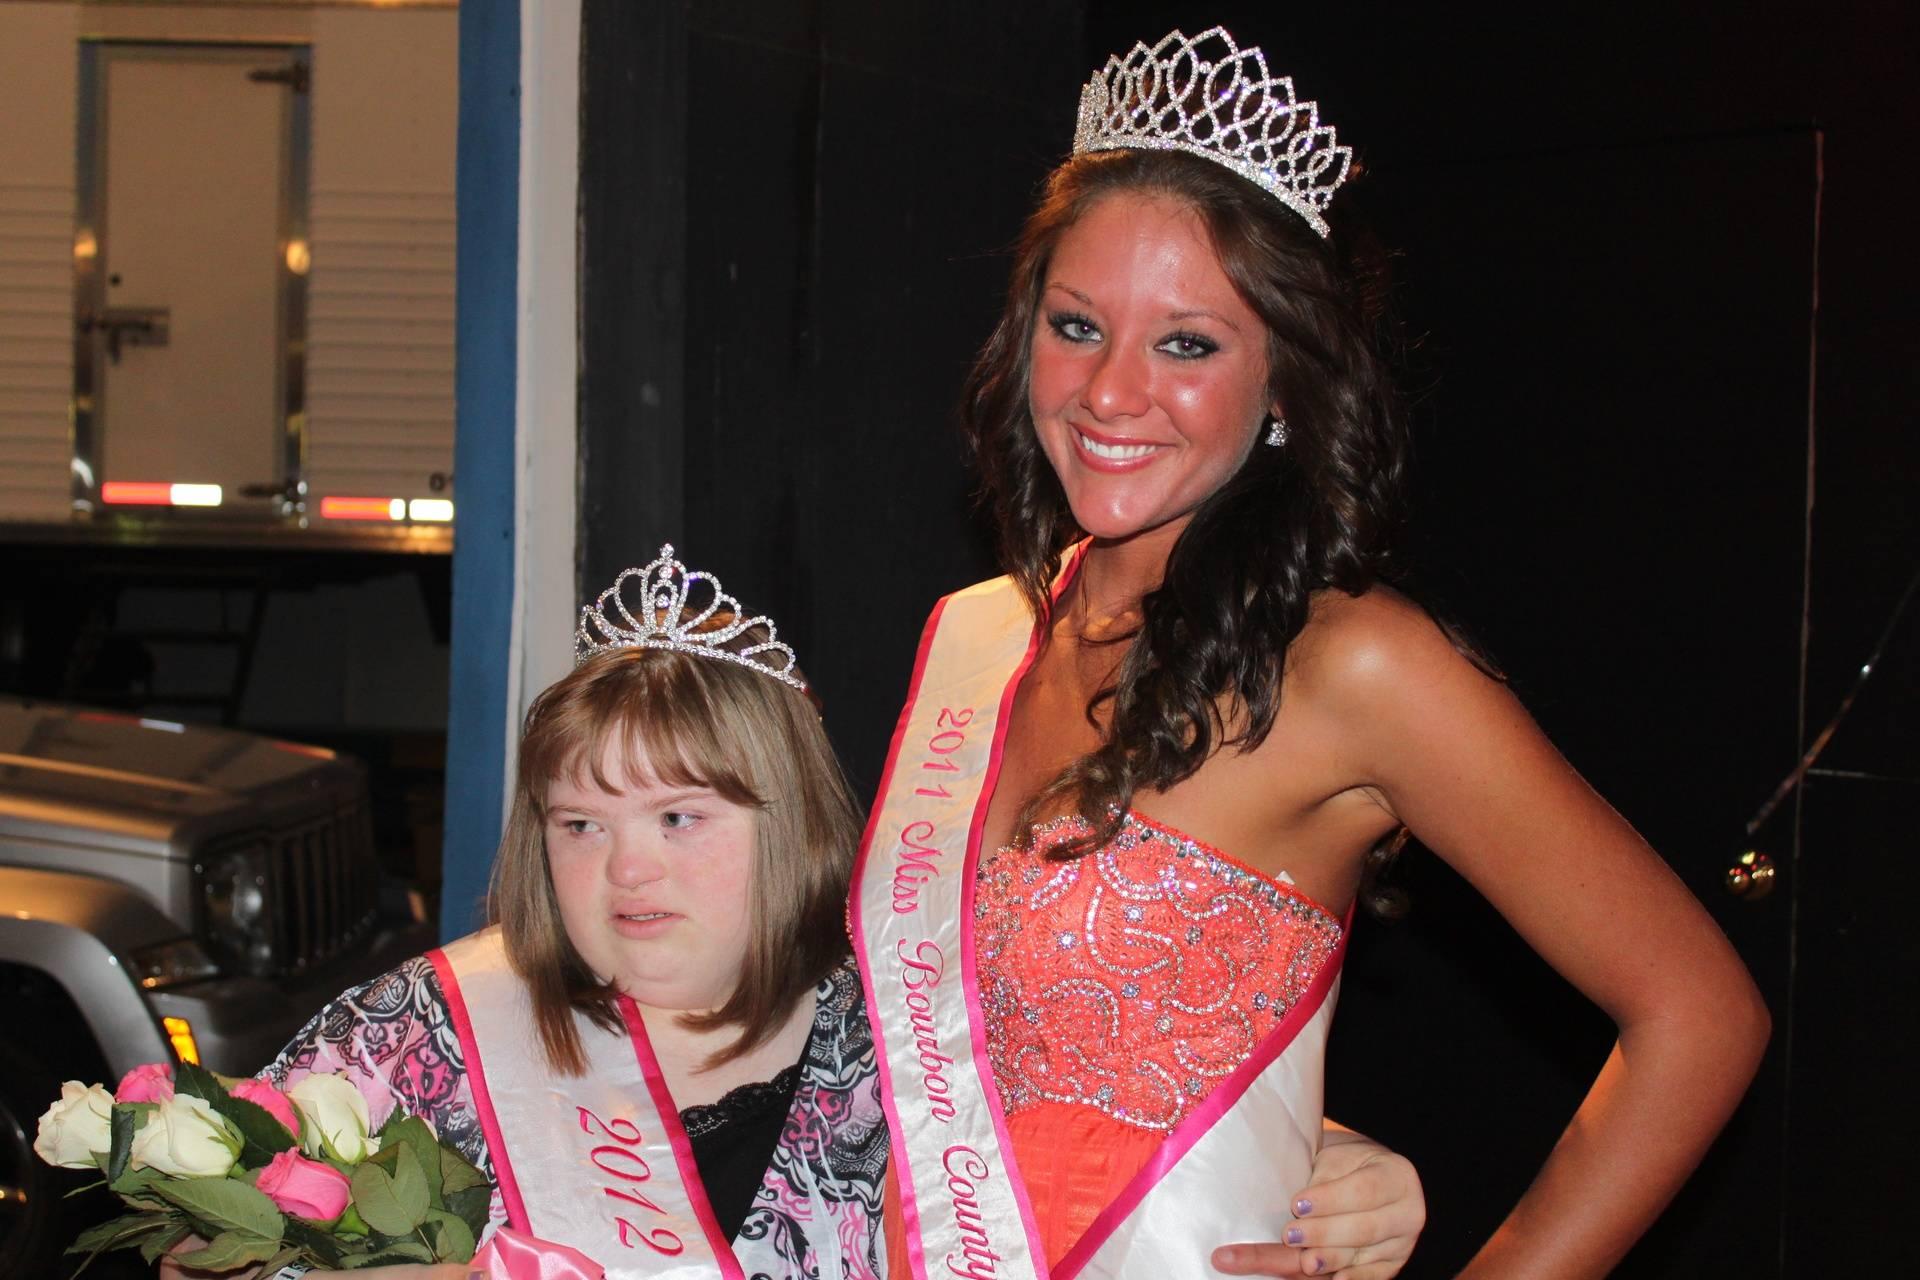 2011 Miss Bourbon County Megan Johnson and Deanna Sallee